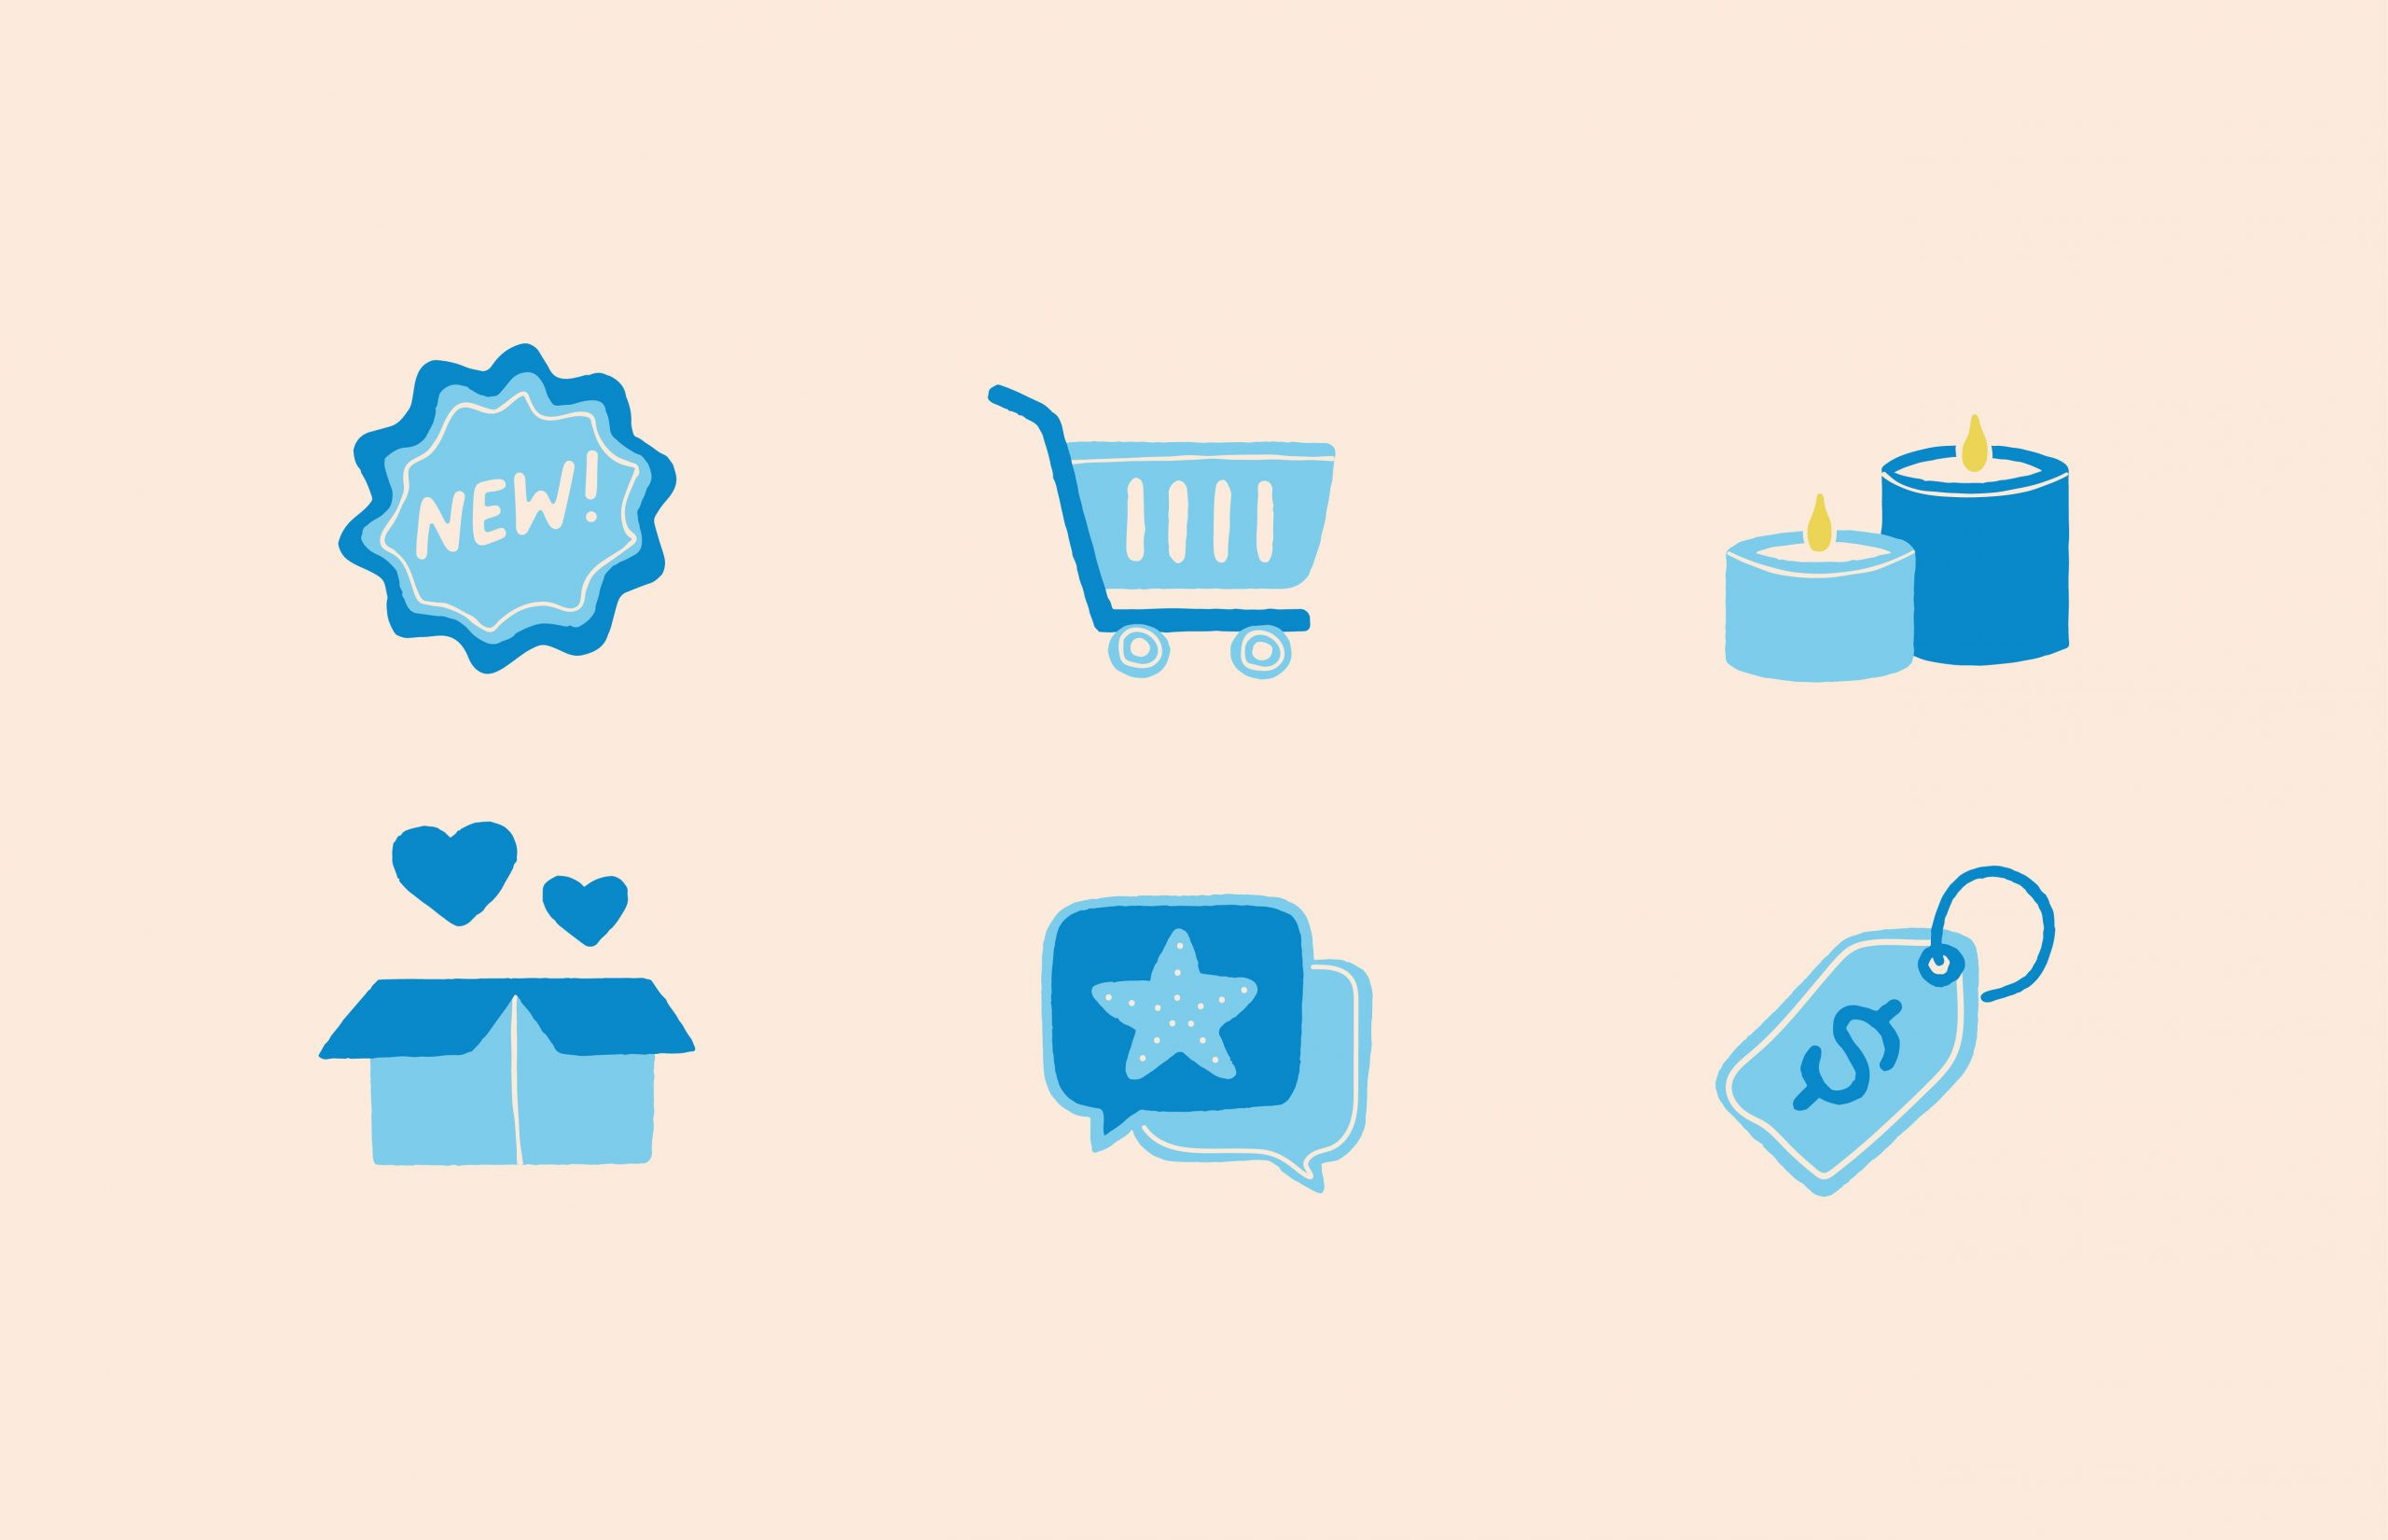 New badge icon, cart icon, candle icon, heart box icon, speech bubble icon, tag icon